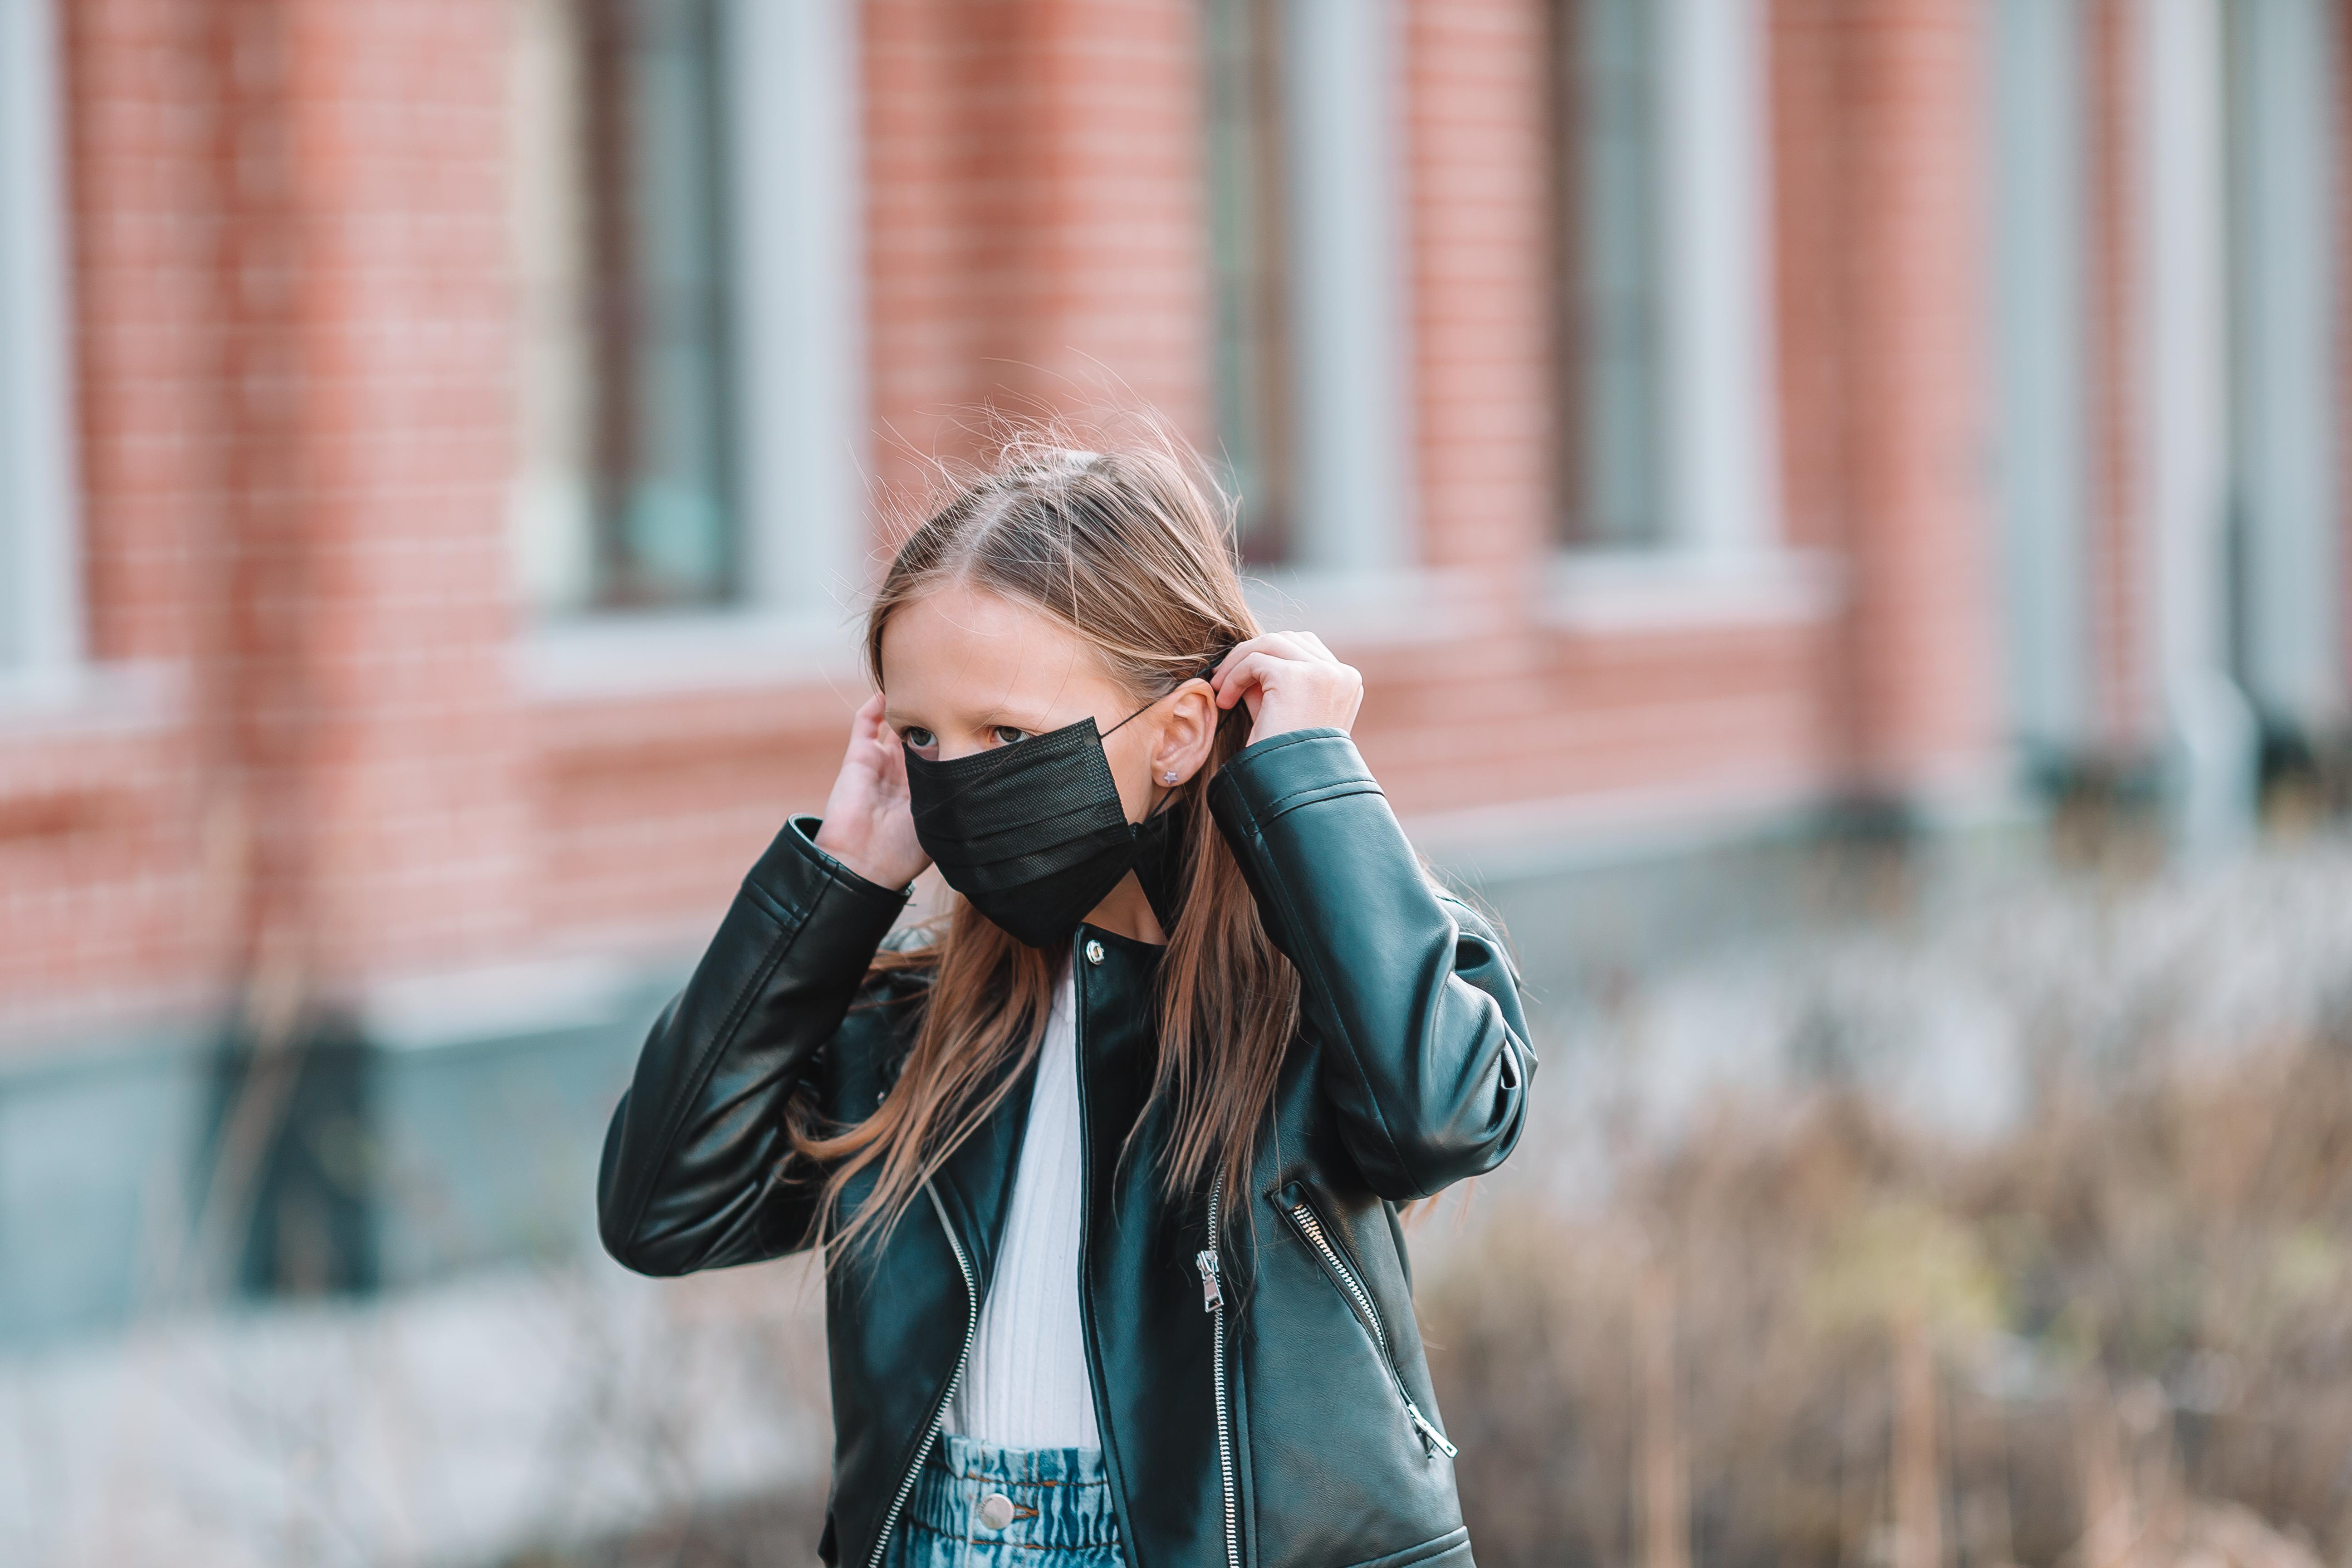 https://watt.co.uk/wp-content/uploads/2020/04/girl-wearing-a-mask-protect-against-coronavirus-an-D7DUKLK.jpg